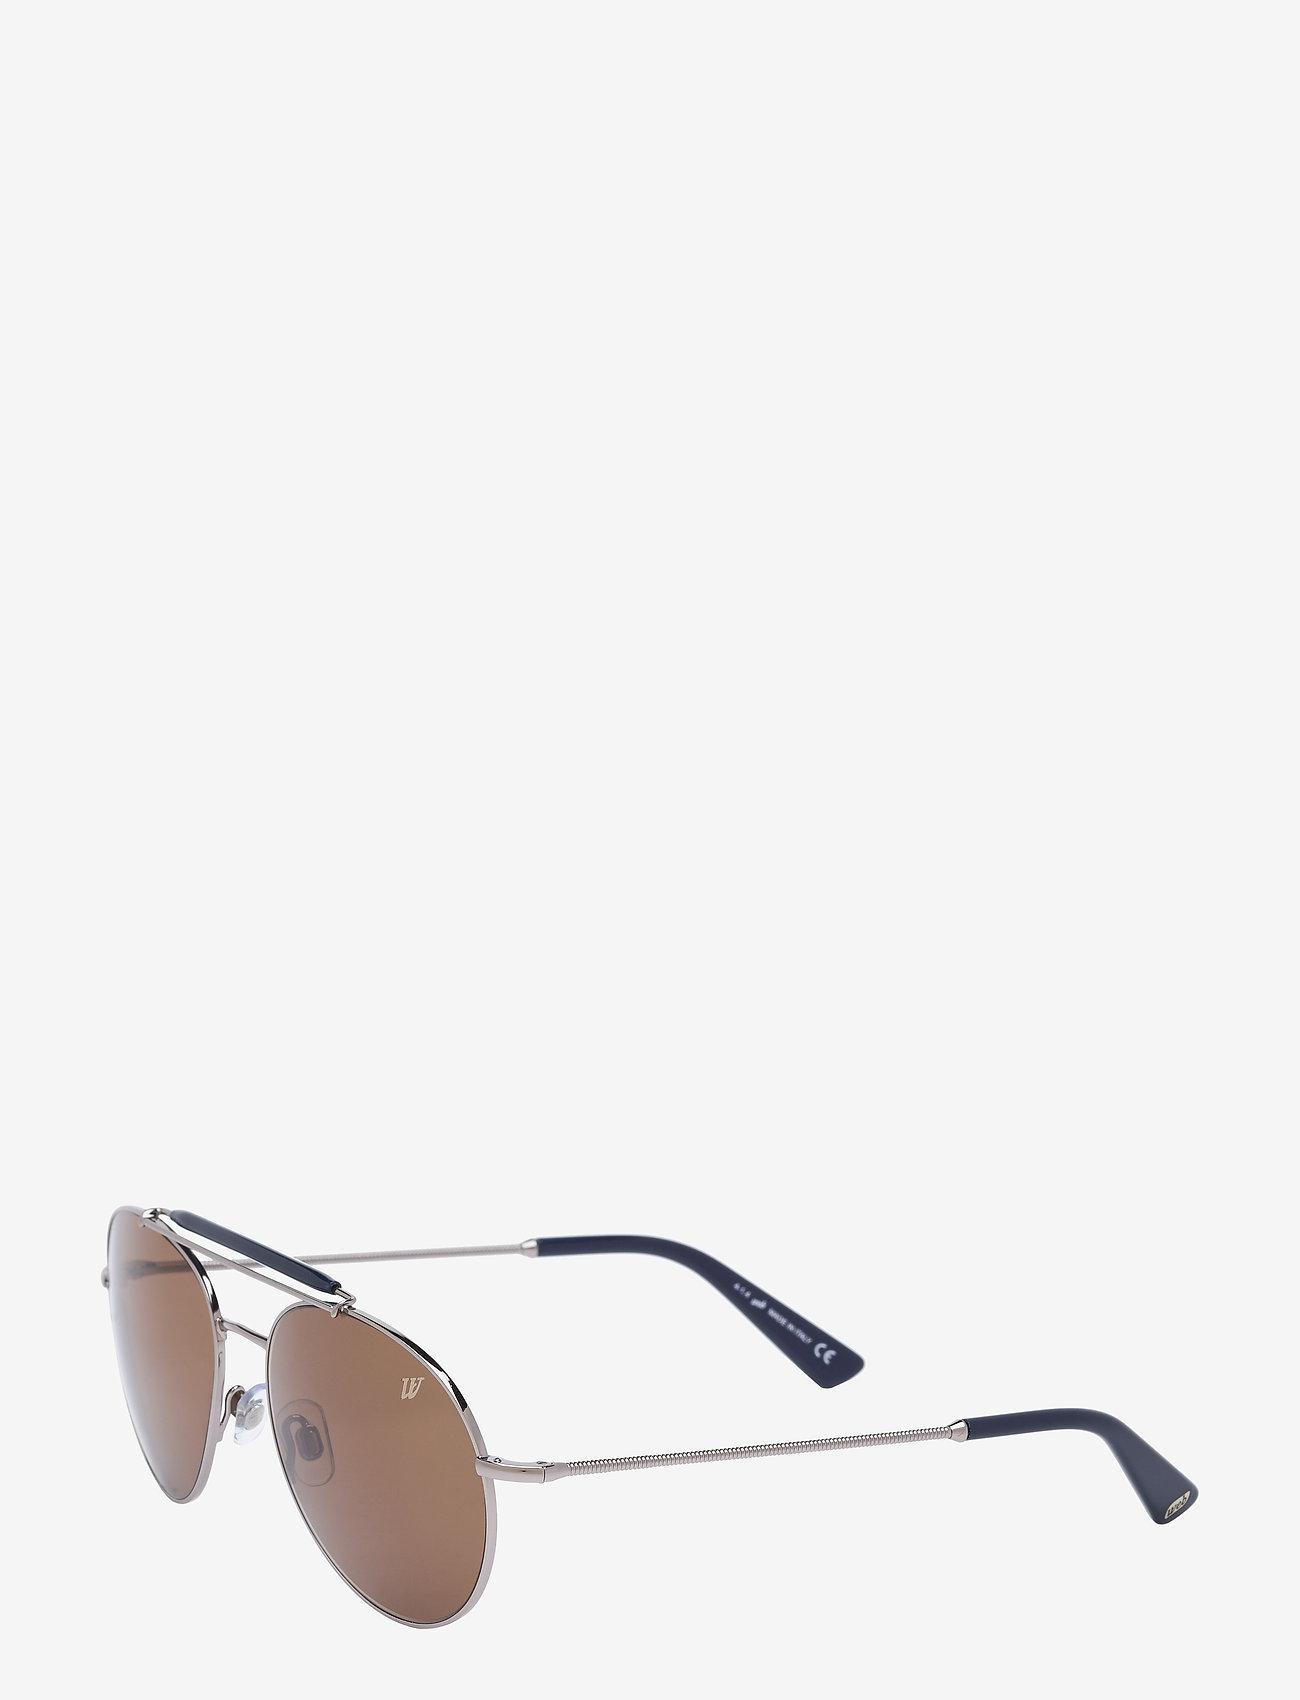 Web Eyewear - WE0126 - aviatora stila - 14j -shiny light ruthenium / roviex - 1